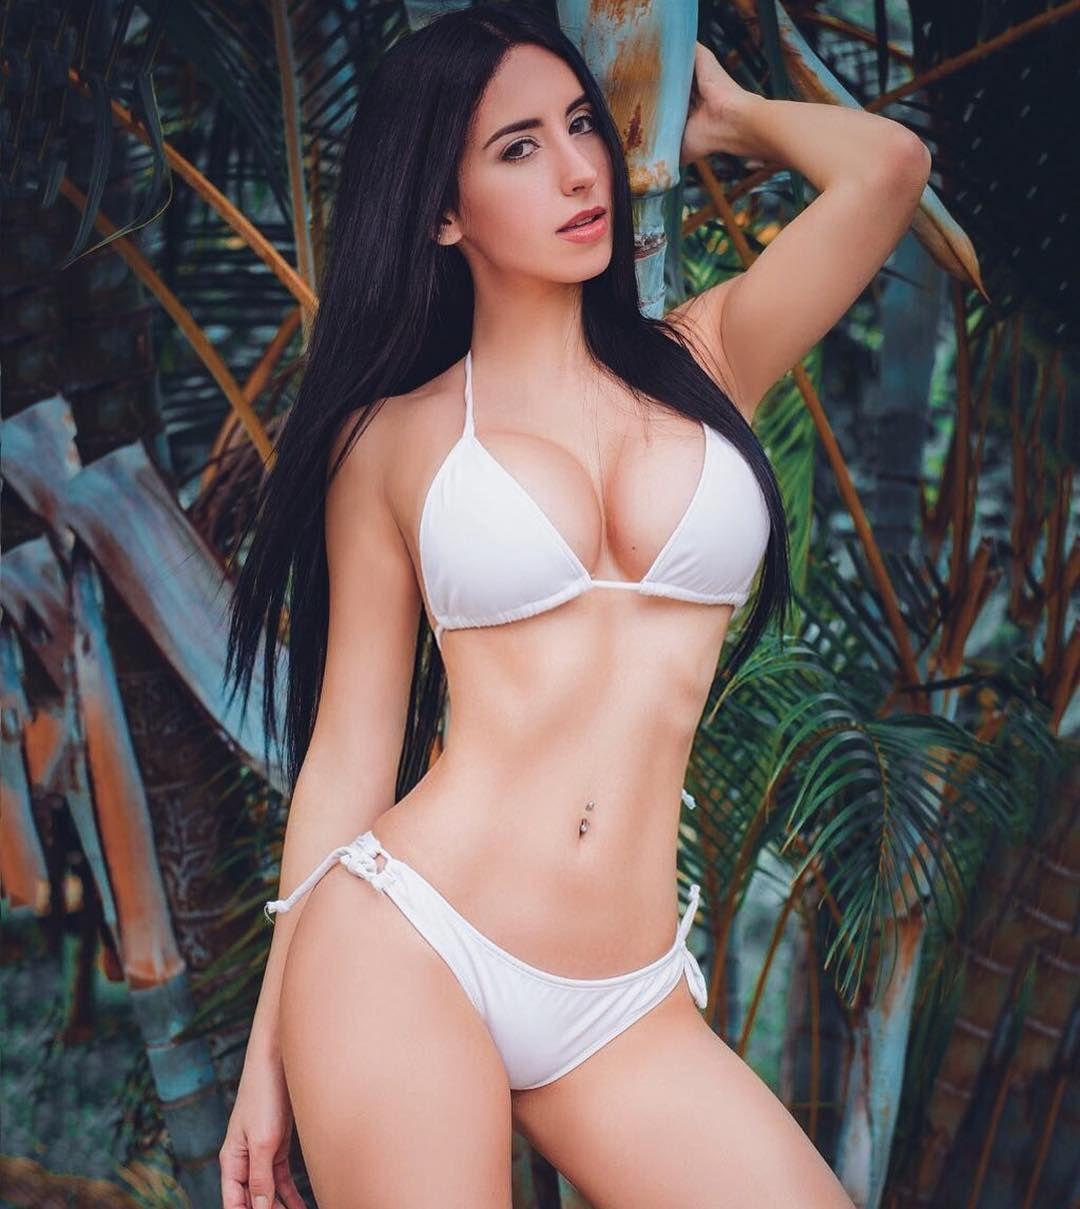 Cleavage Maria Fernanda Padilla nude photos 2019